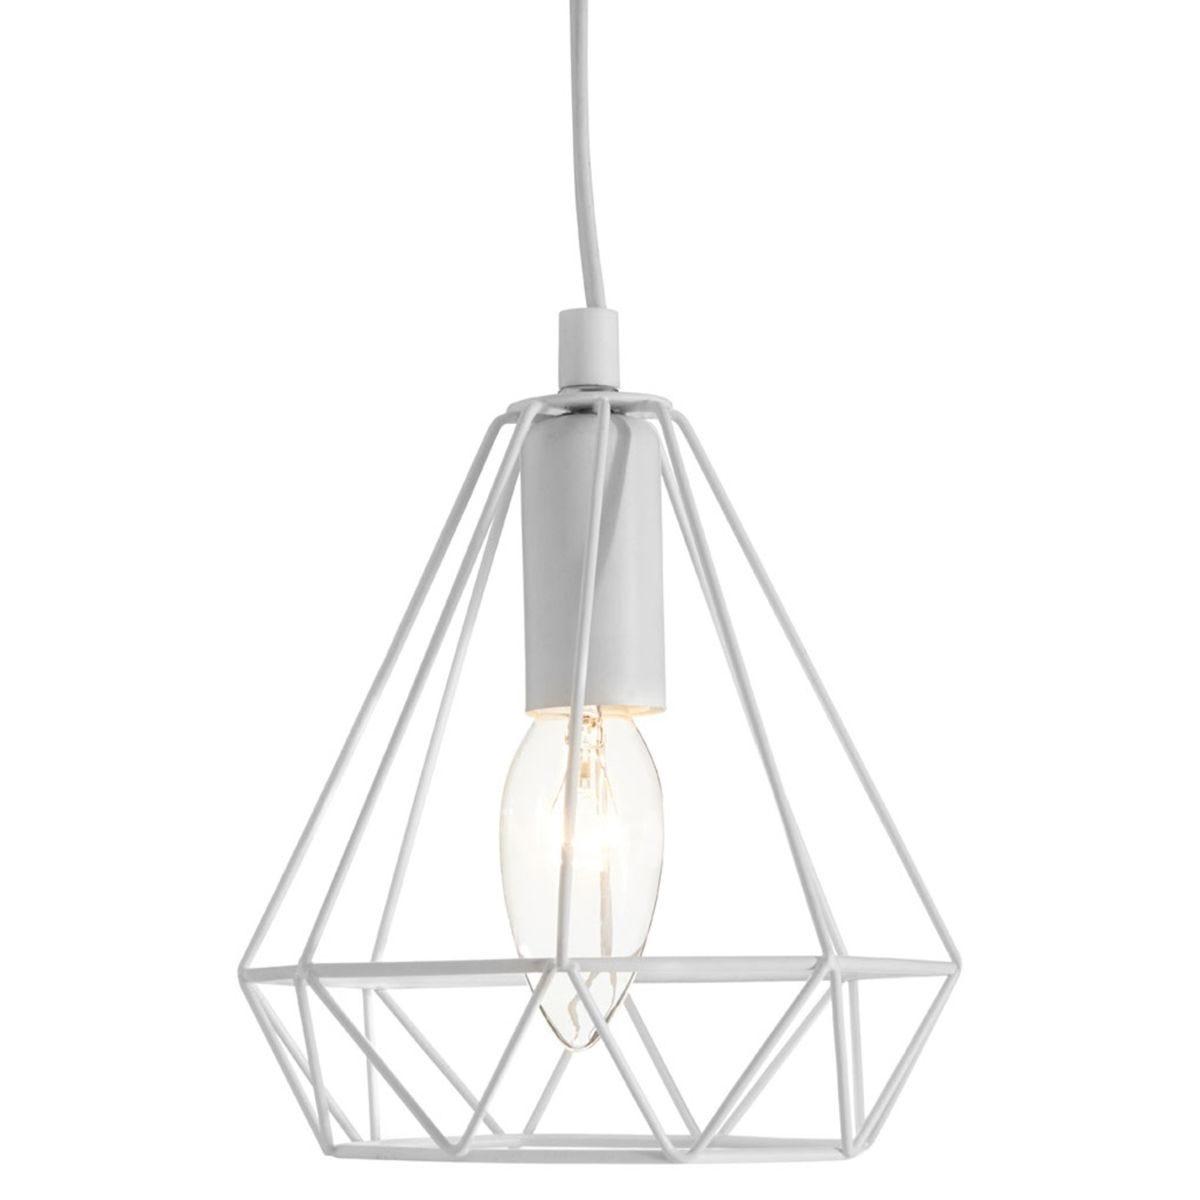 Premier Housewares Beli Pendant with Light Metal Wire - White